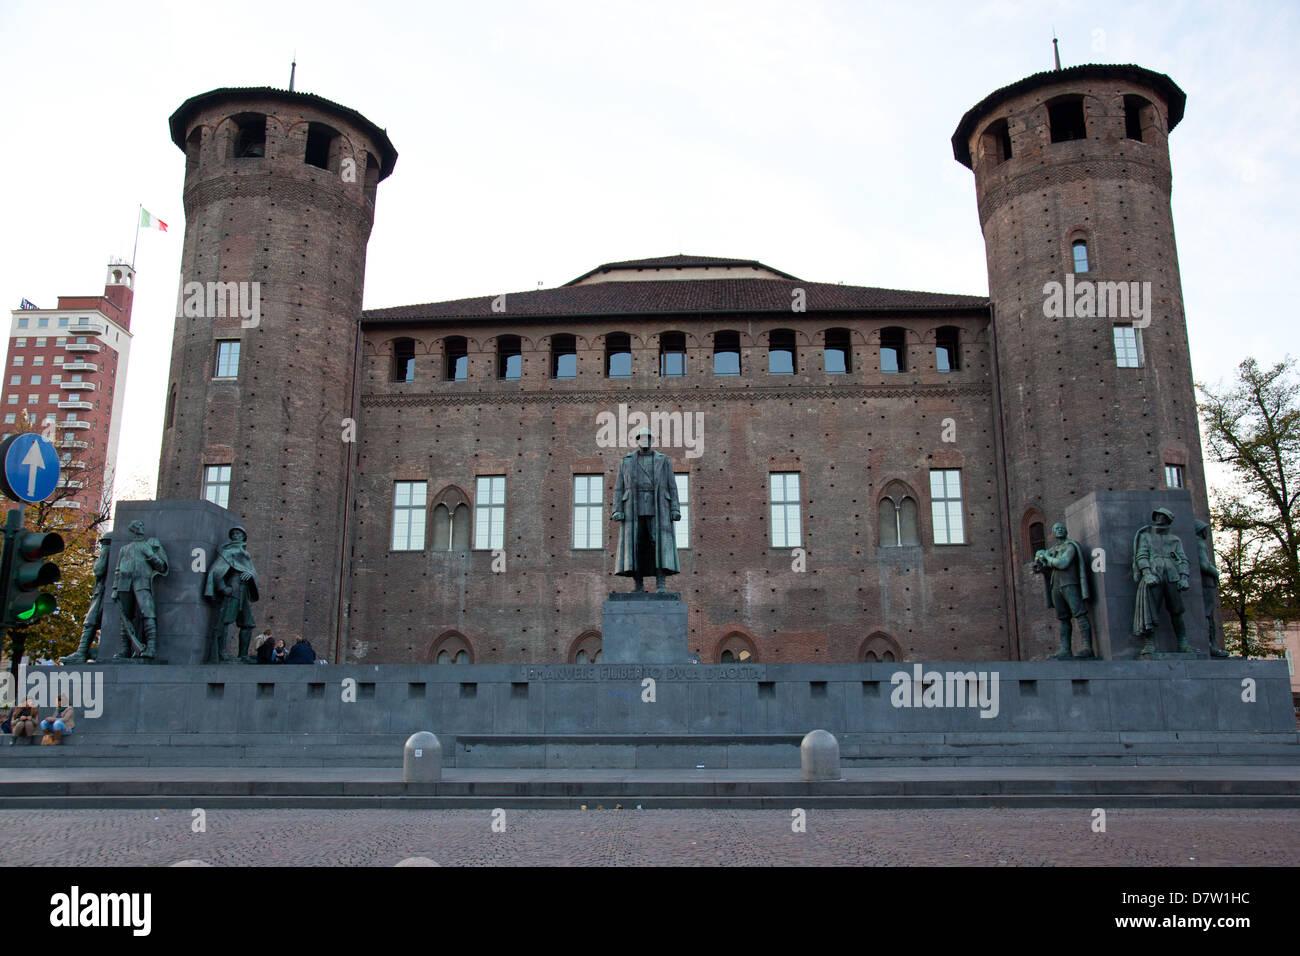 Casaforte degli Acaja, the rear area of Palazzo Madama, Turin, Piedmont, Italy - Stock Image